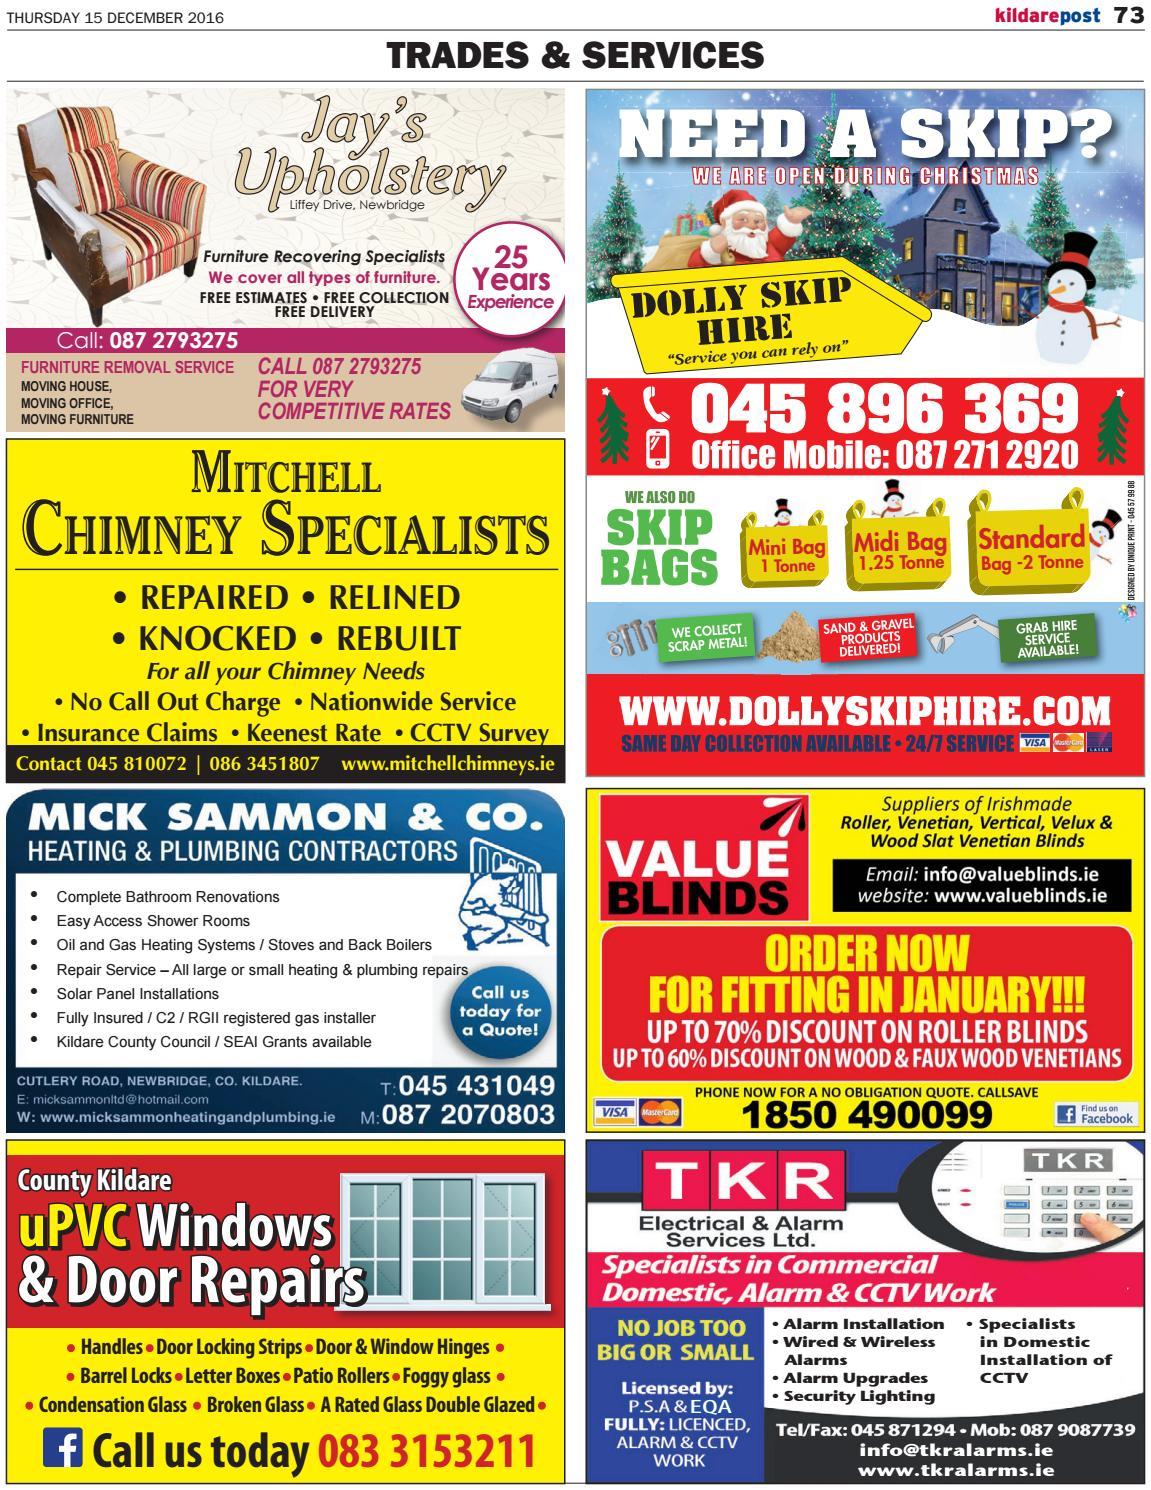 Bathroom Renovation Kildare kildare post 15 12 16river media newspapers - issuu